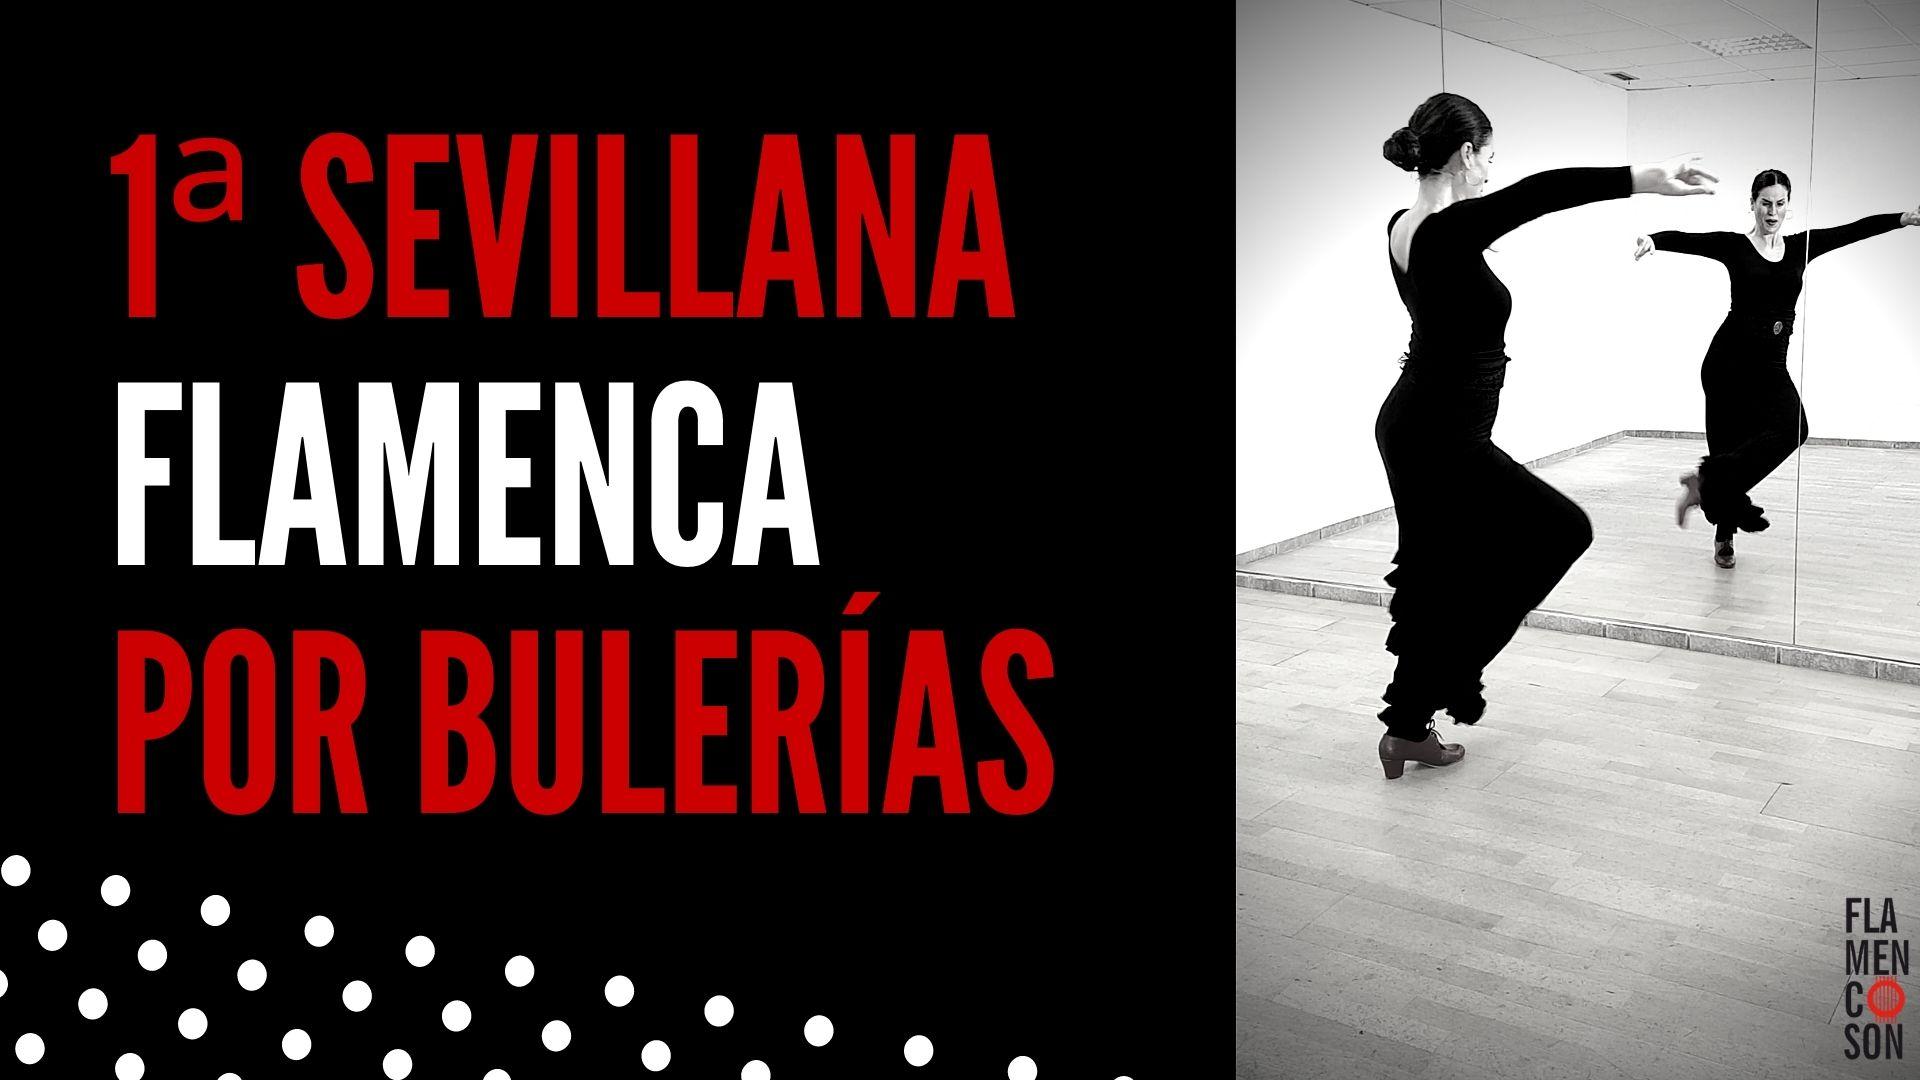 Aprender a Bailar la Primera Sevillana Flamenca por Bulerías